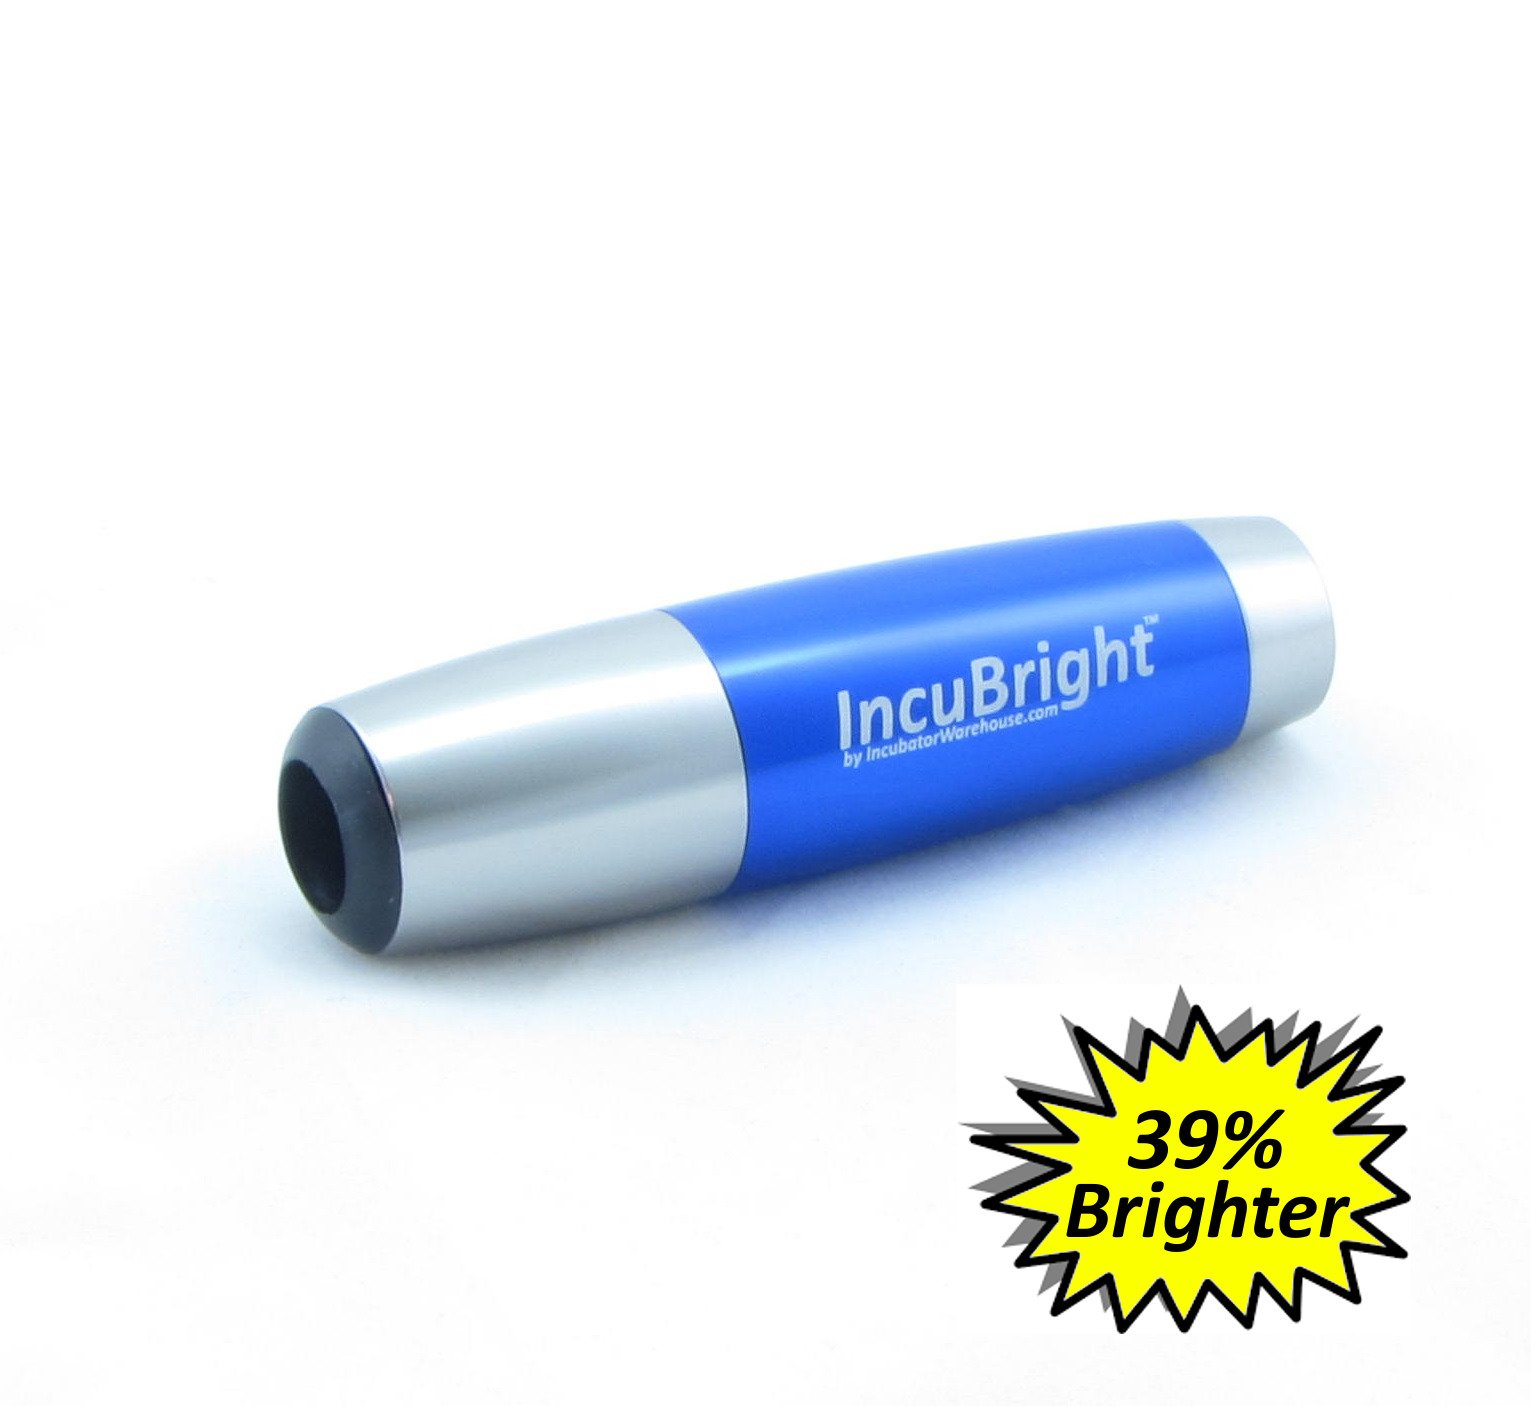 Incu-Bright Ultra Bright LED Egg Candler - Incubator Warehouse Exclusive